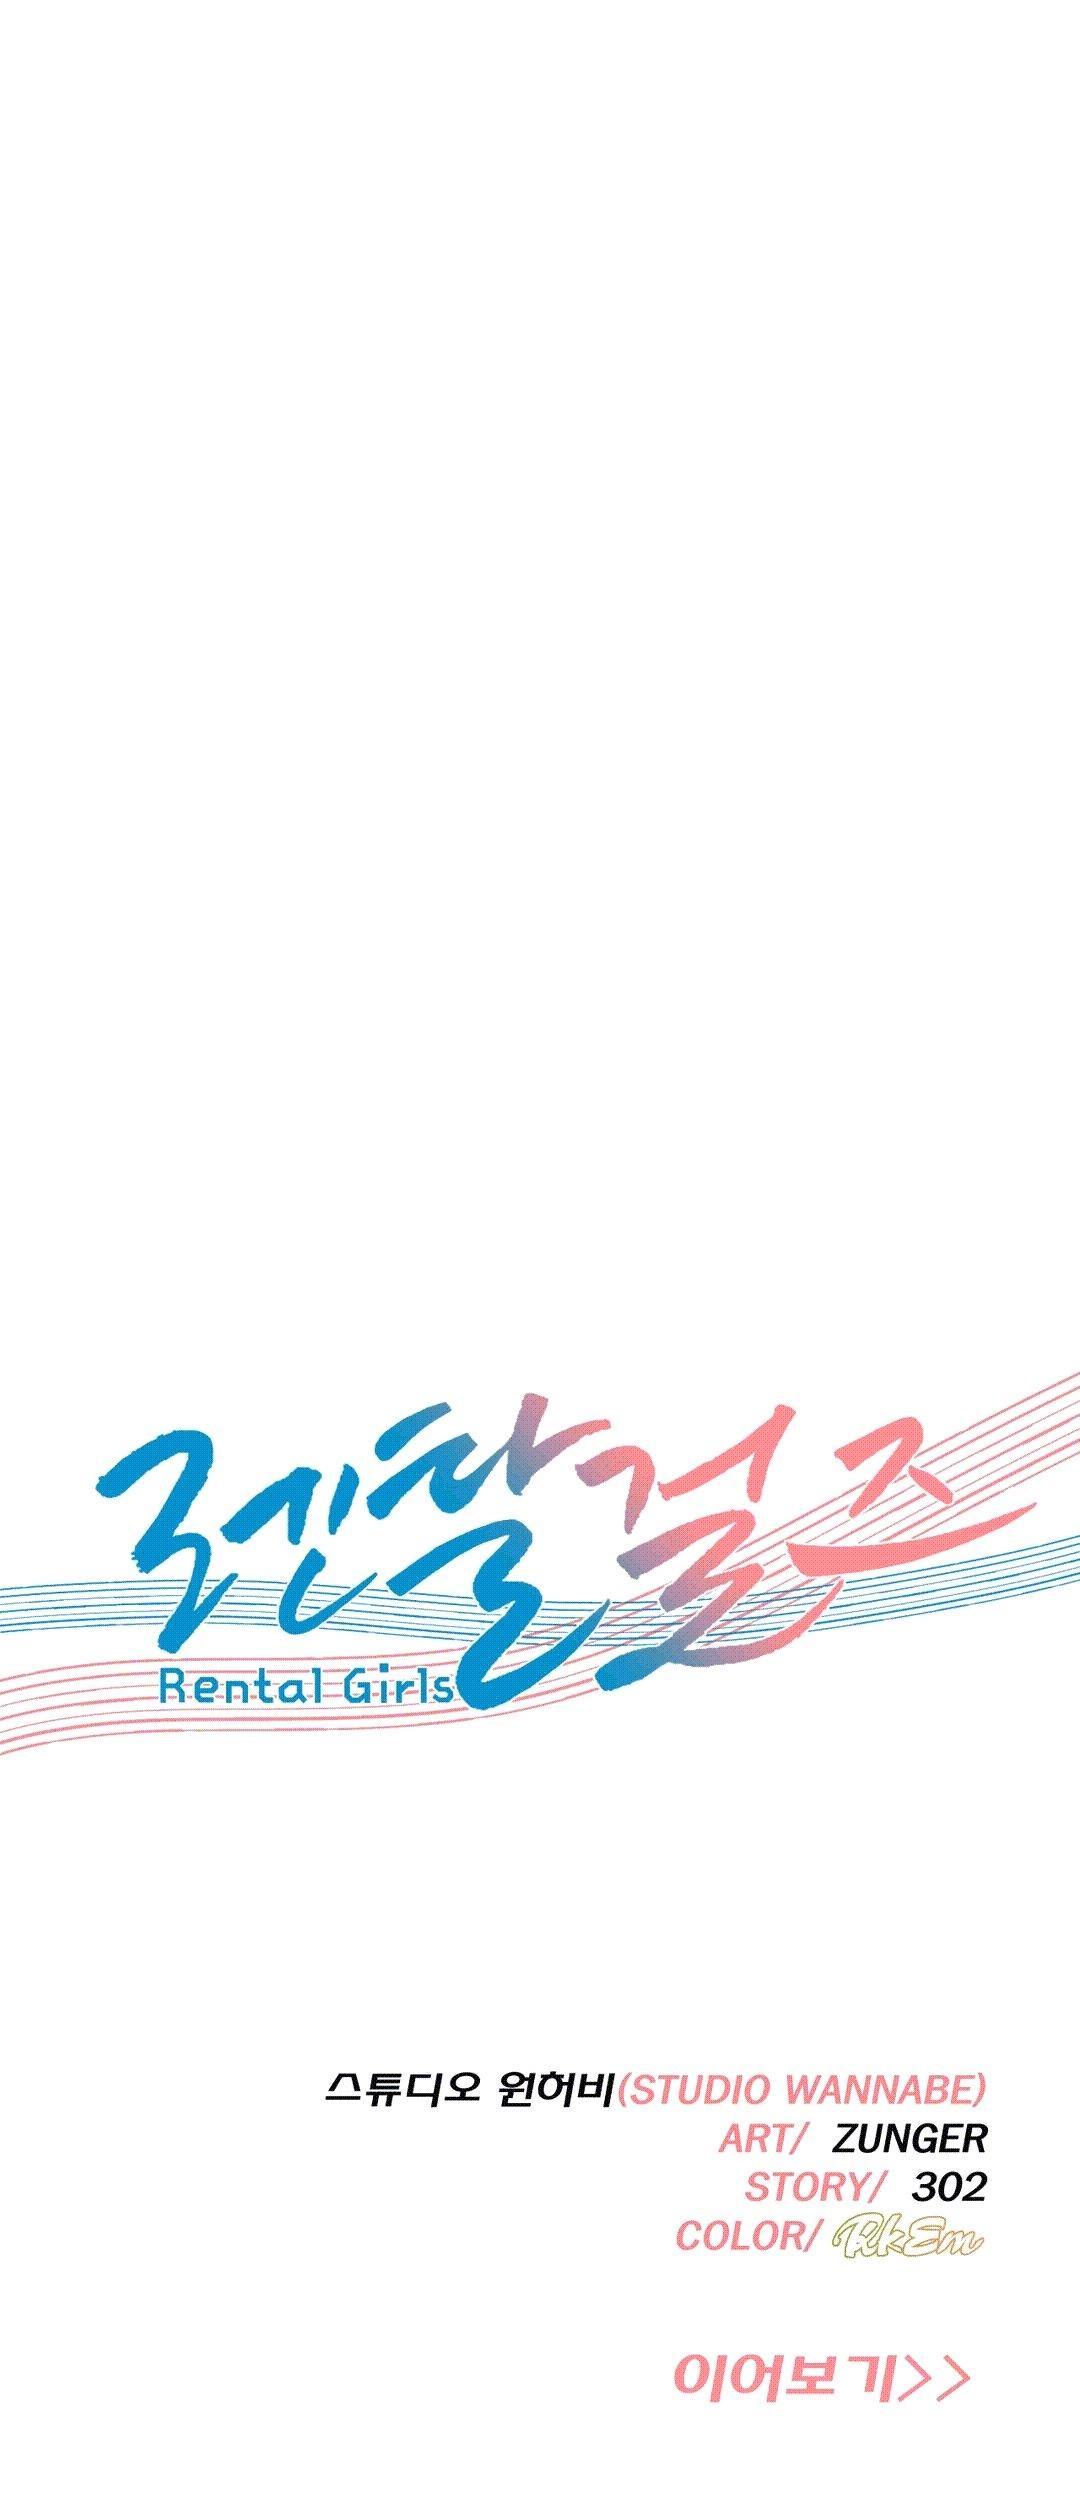 [Studio Wannabe] Rental Girls | 出租女郎 Ch. 33-58 [Chinese]  第二季 完结 608